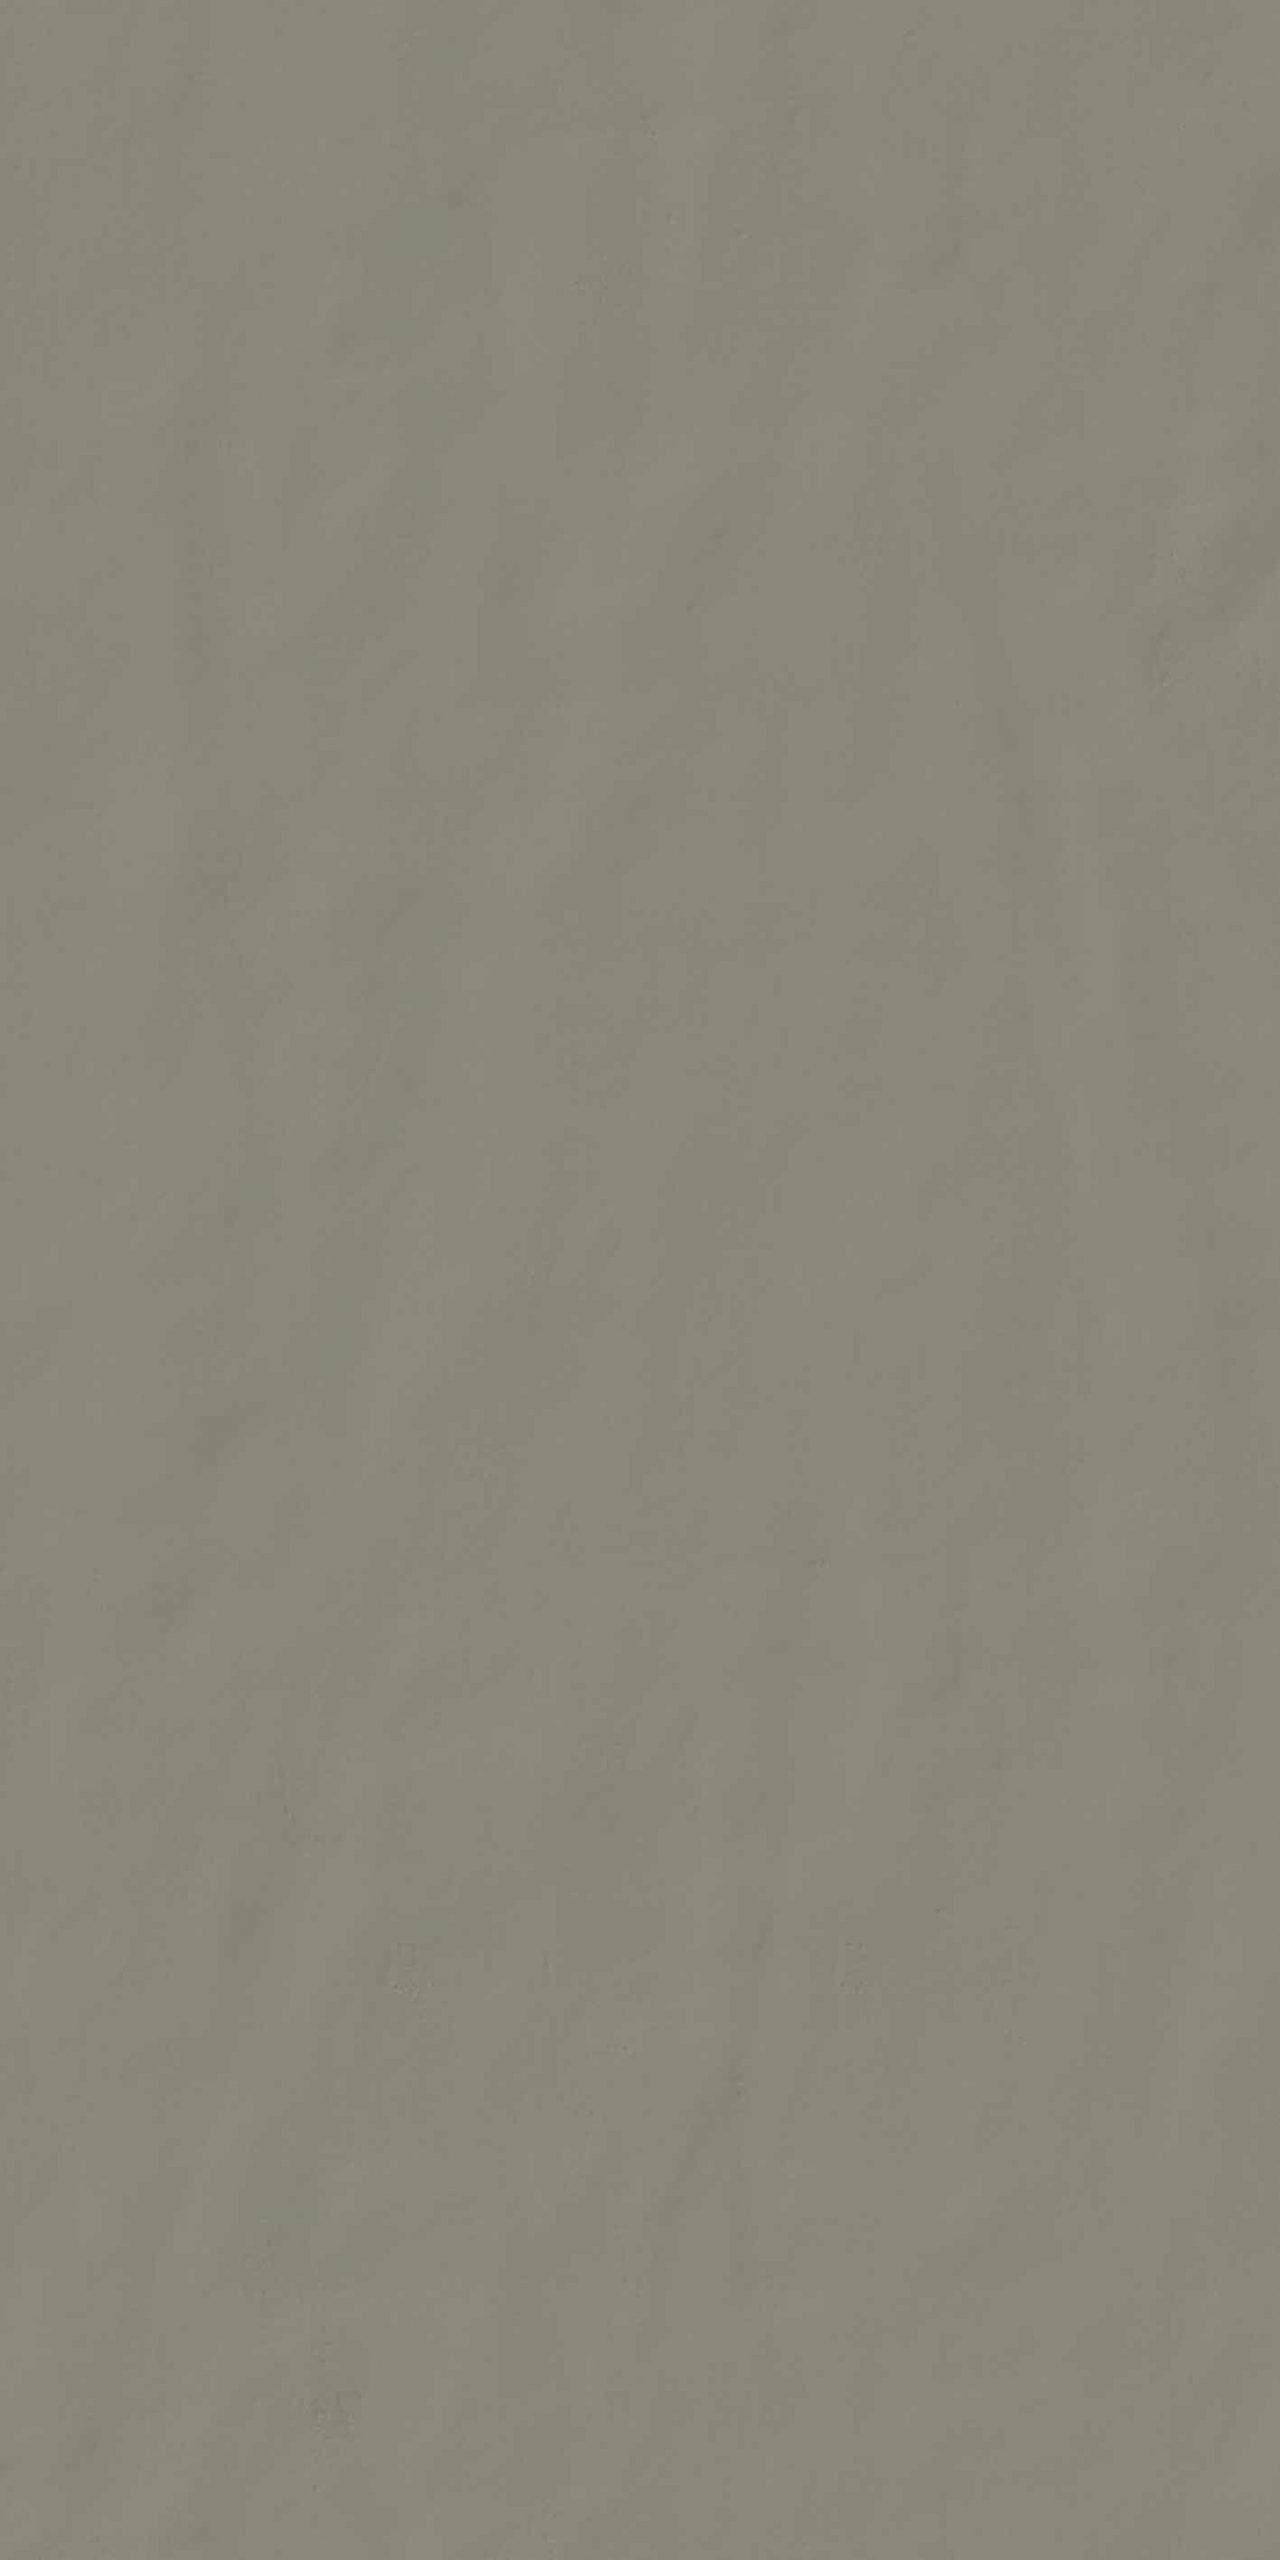 Neutra 6.0 Quarzo 05 Matte 10mm 60 x 120